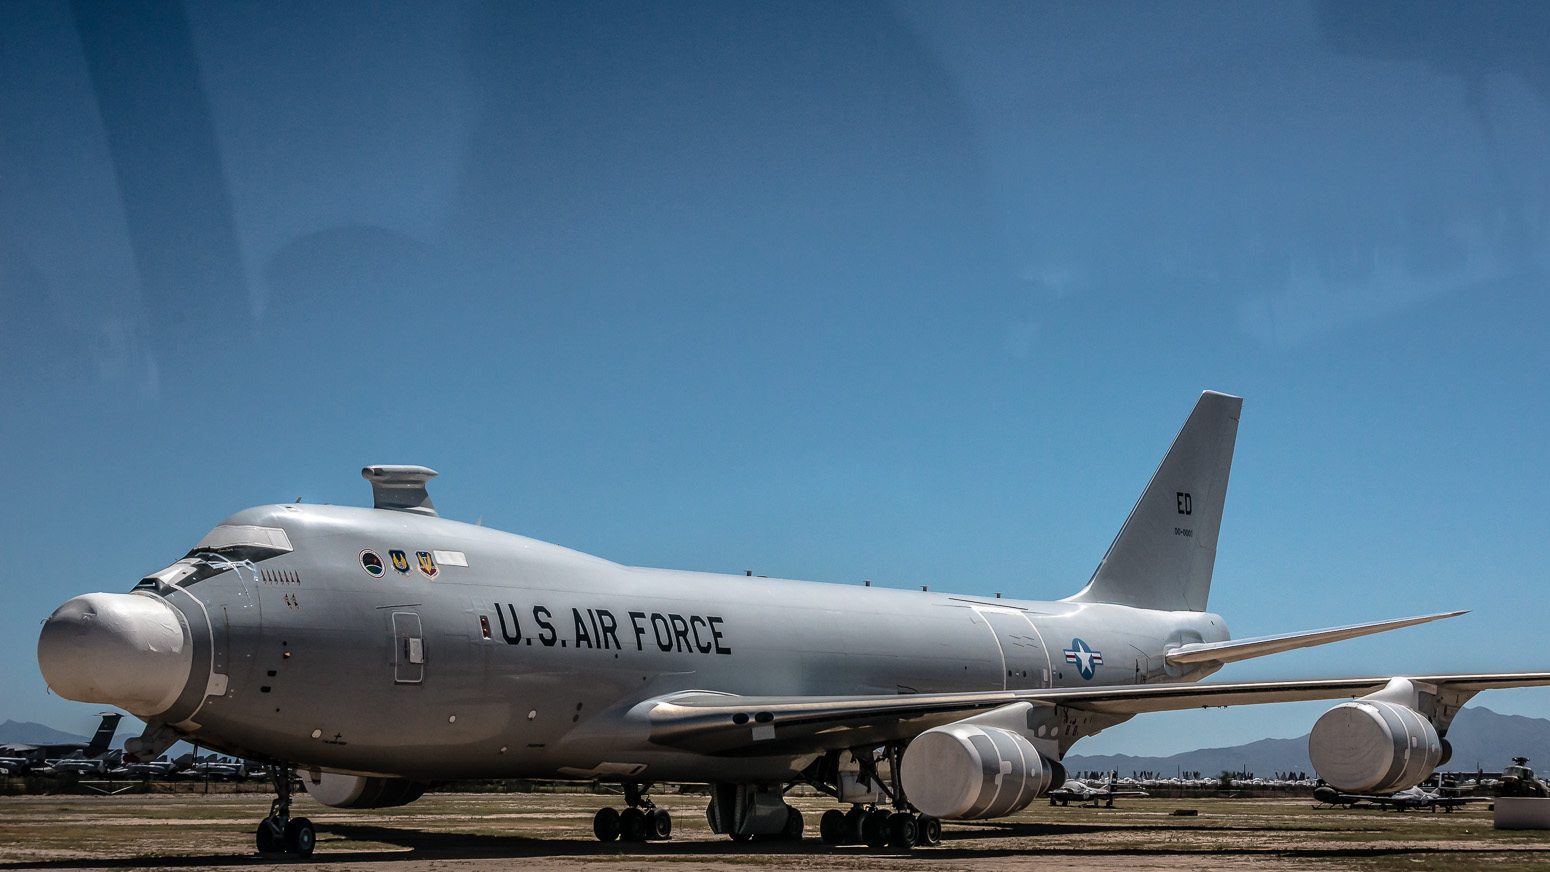 Boeing YAL-1A, Anti-Ballistic Missile Weapons System, The Boneyard, Davis-Monthan Air Force Base, Tucson, USA